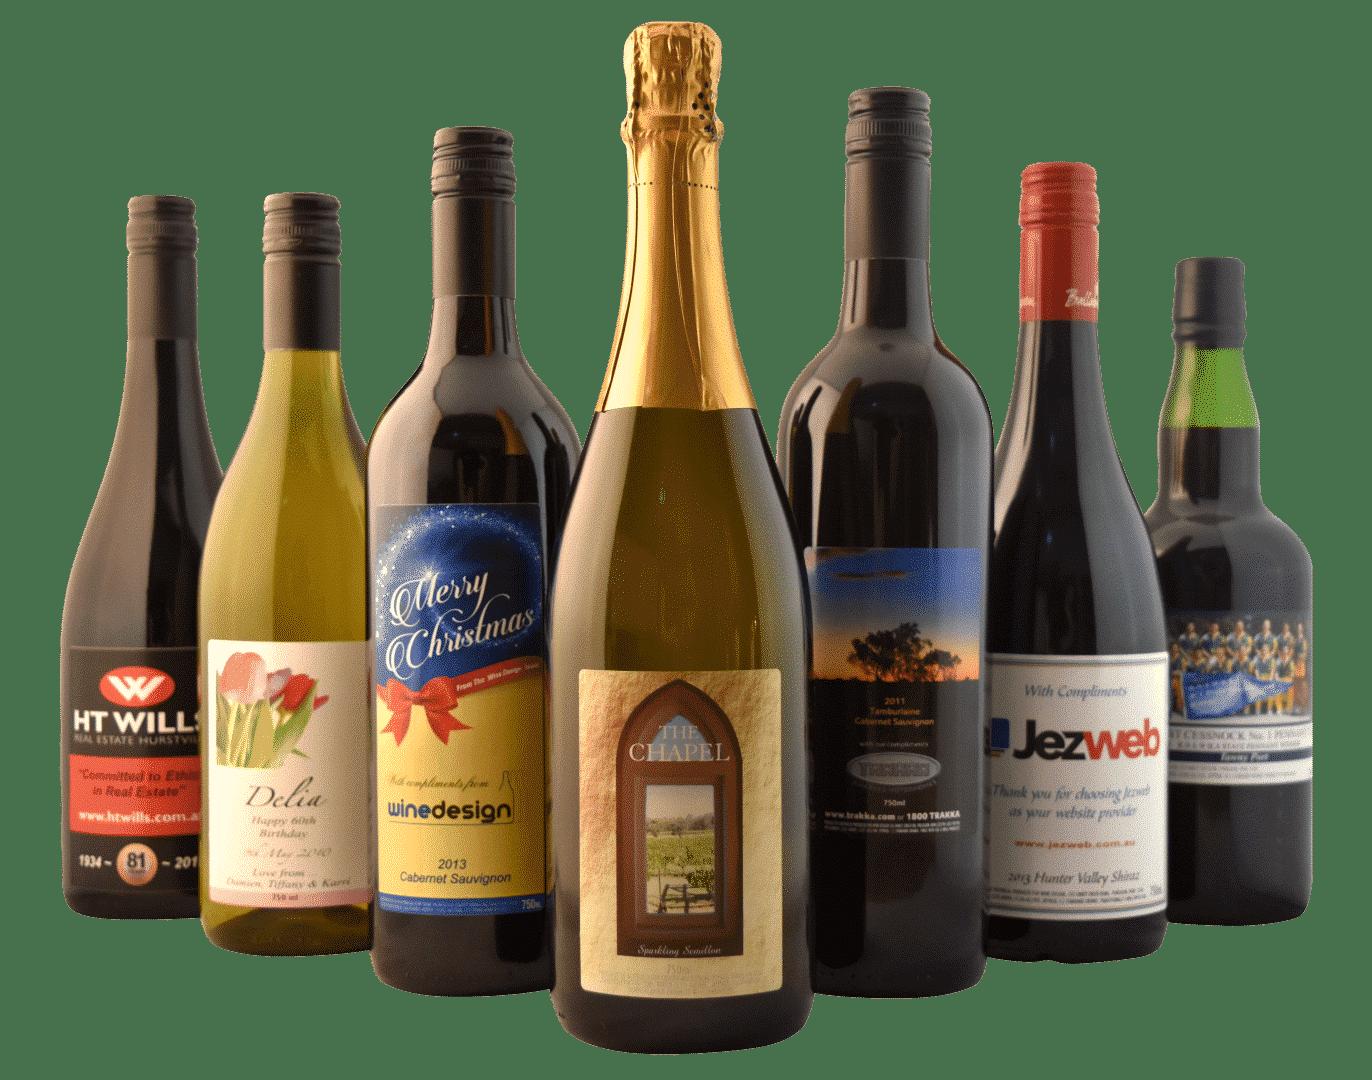 customised wine labelling, wine labelling, wine design, wedding wine, wine label, customised wine labelling